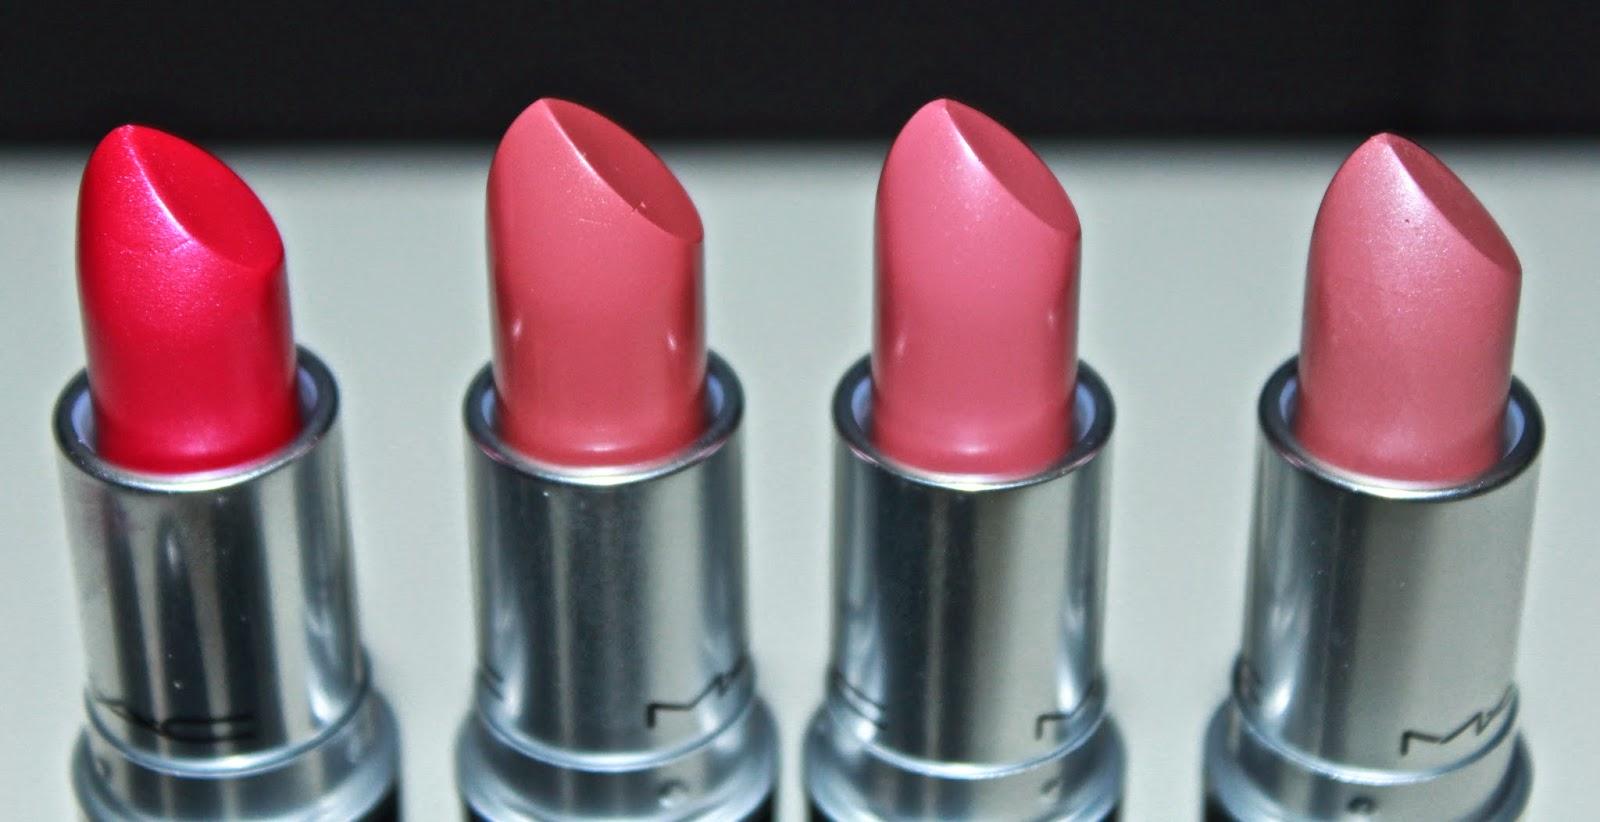 MAC Pink Poodle, Fanfare, Please Me & Angel Lipsticks Close Up